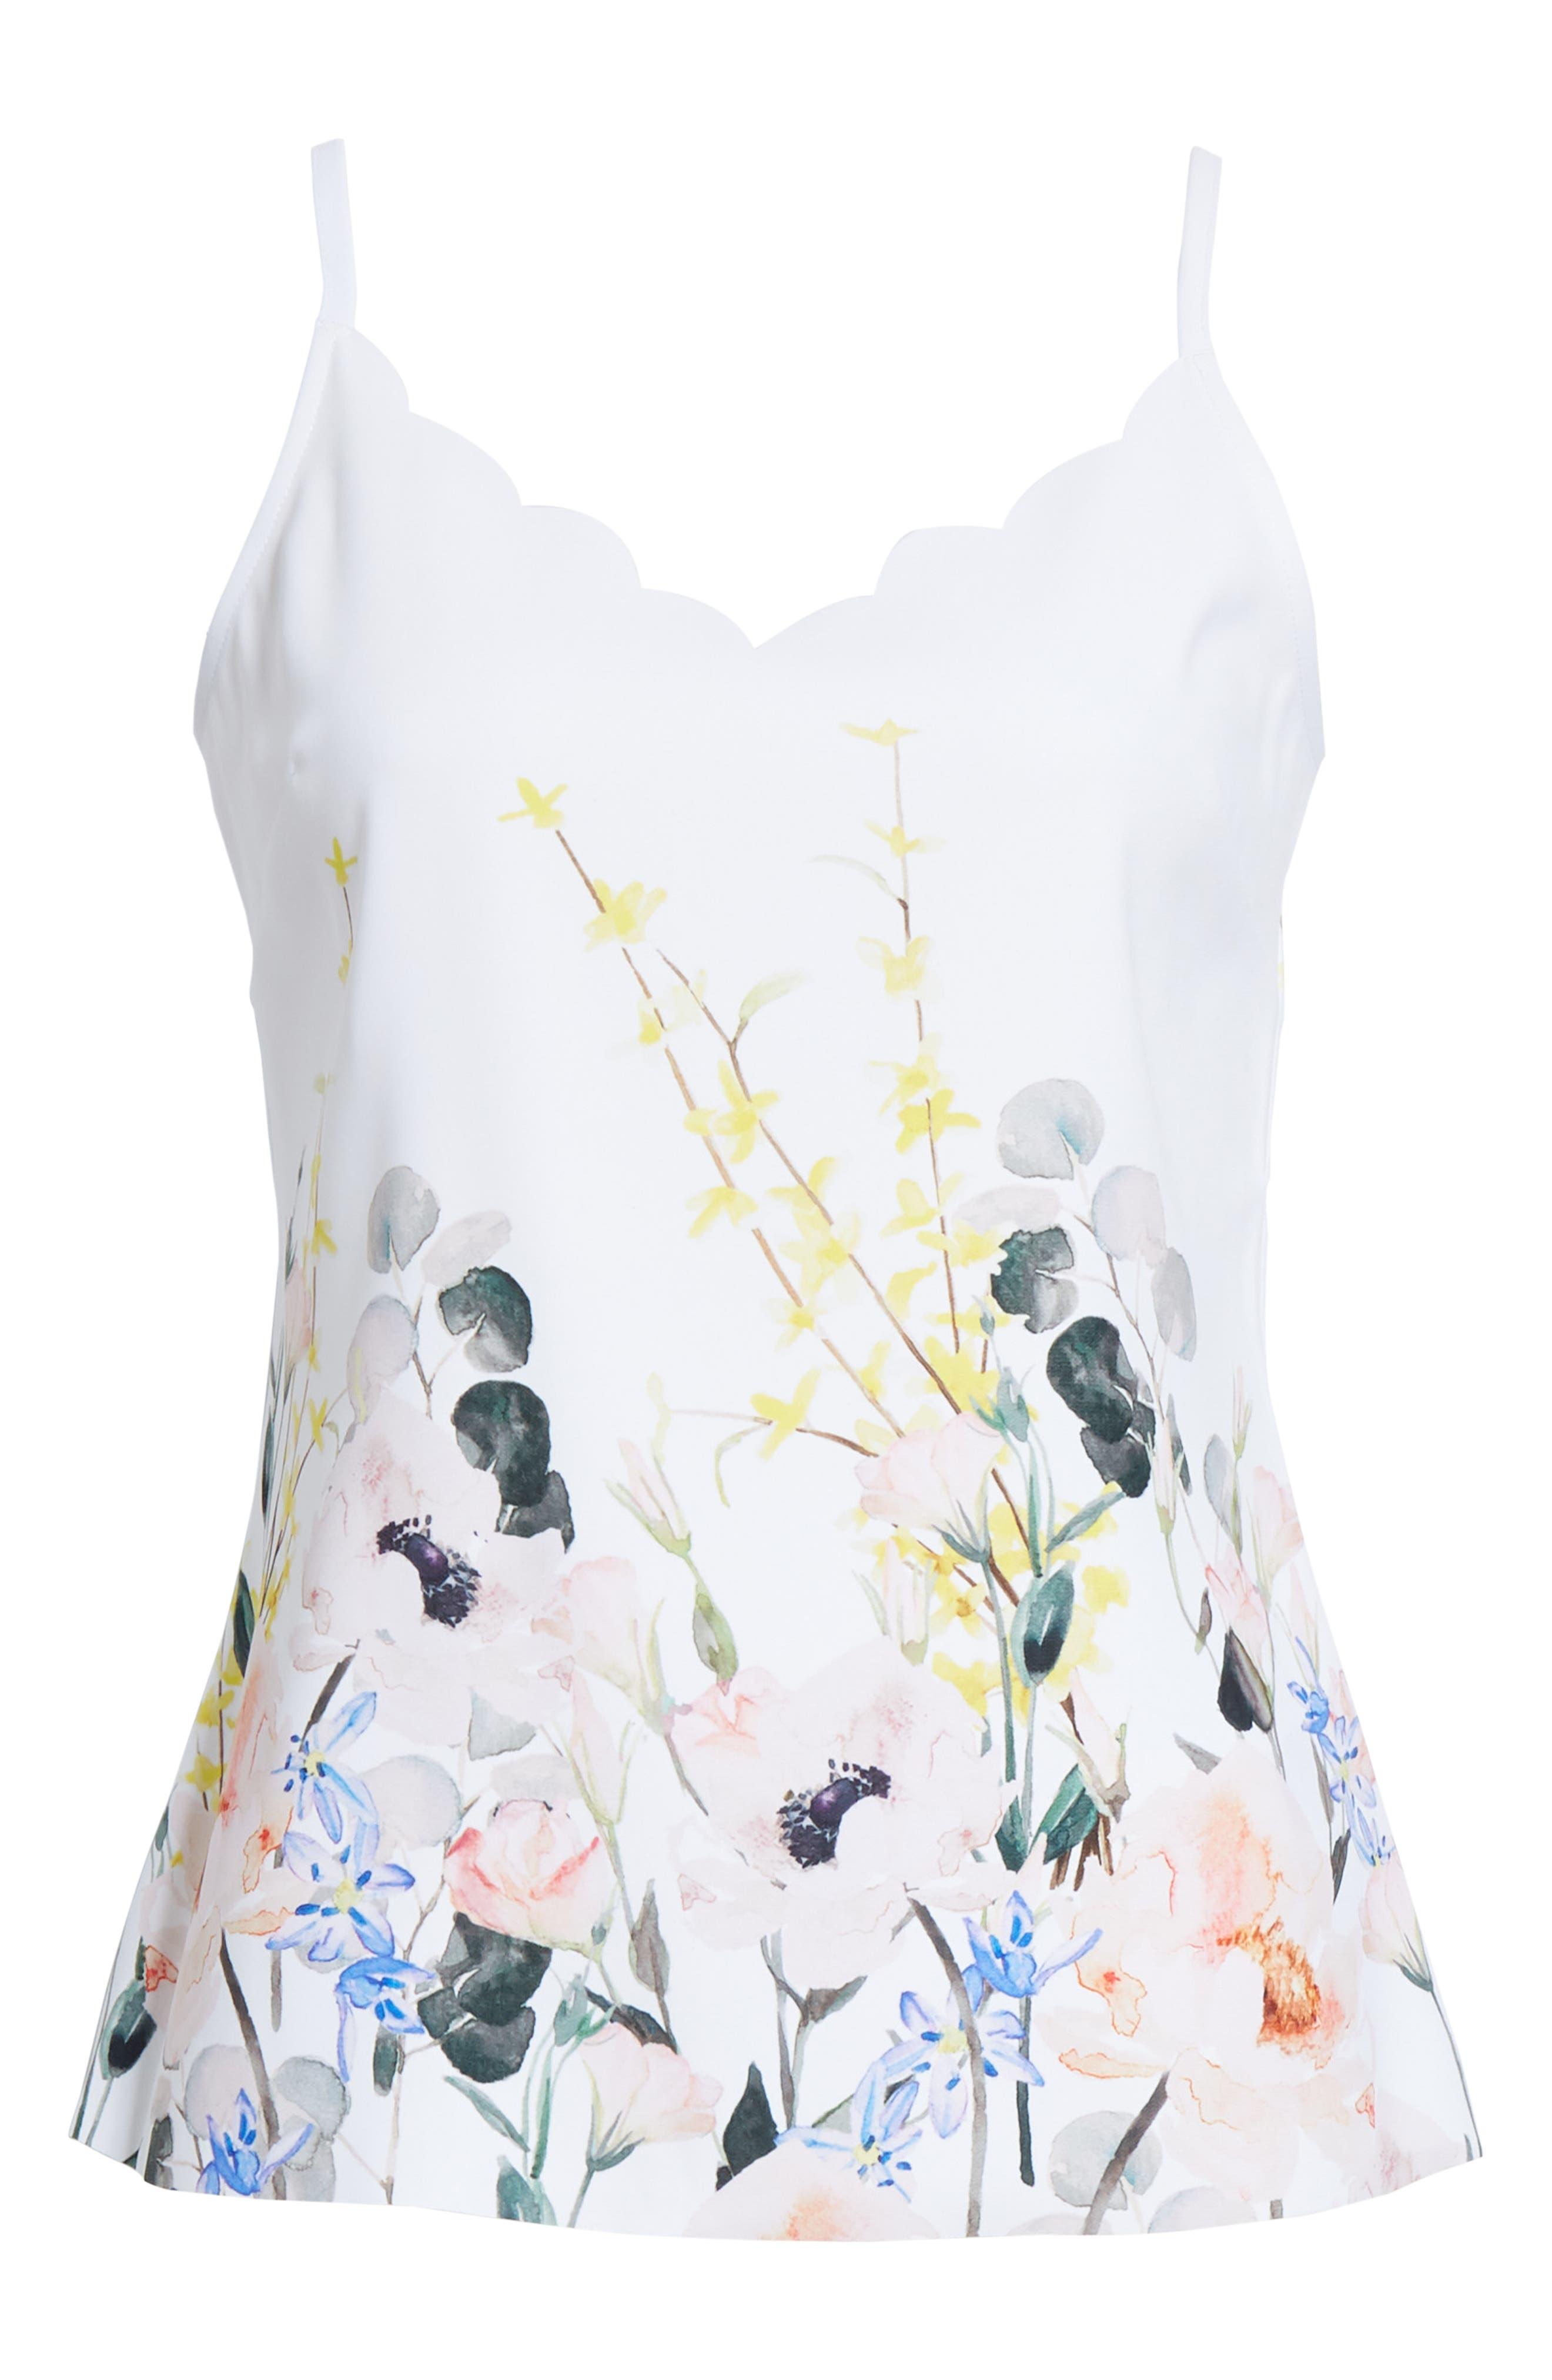 Ziina Elegance Scallop Camisole,                             Alternate thumbnail 6, color,                             WHITE